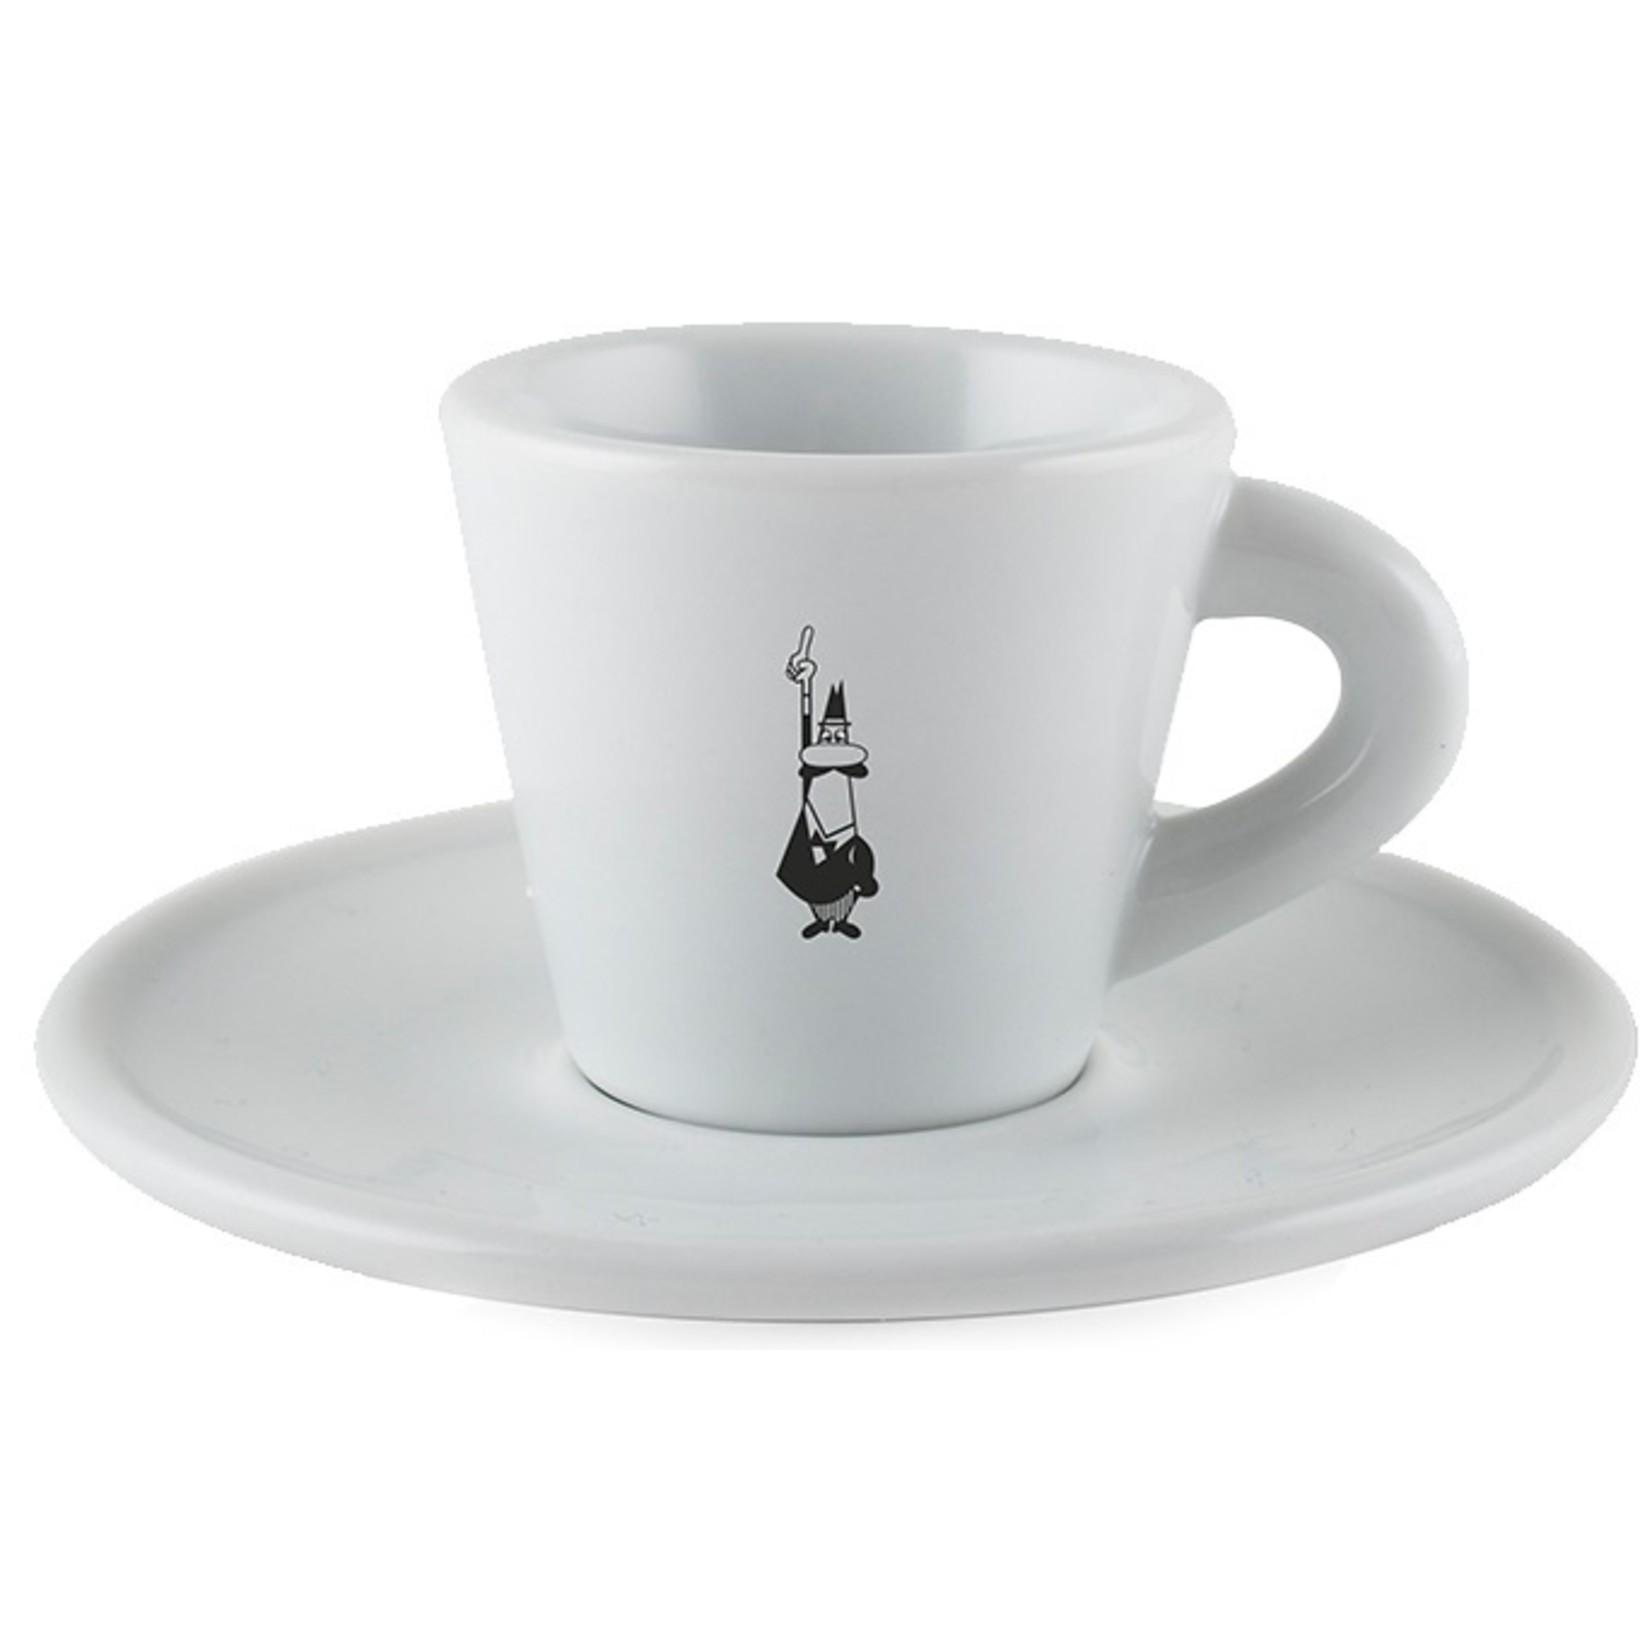 Bialetti Bialetti espressokopje met schotel porselein